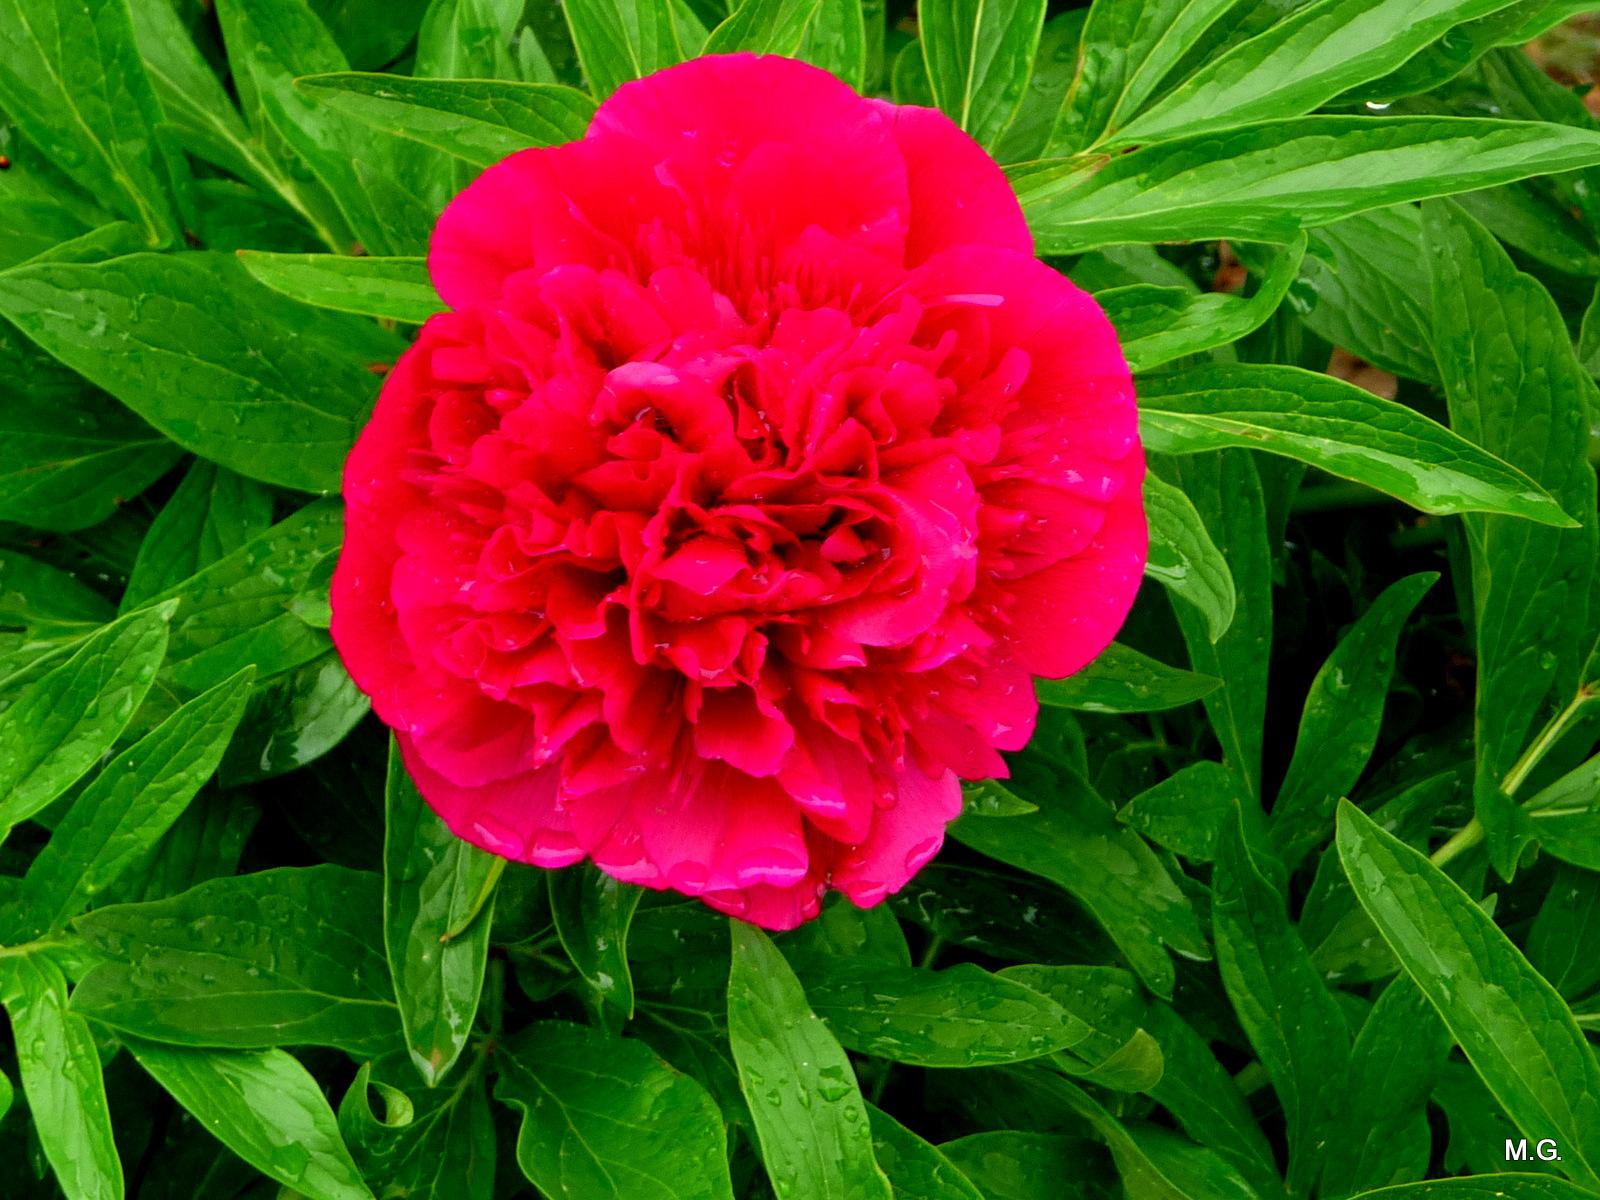 Les Fleurs Du Jardin Euroseconde